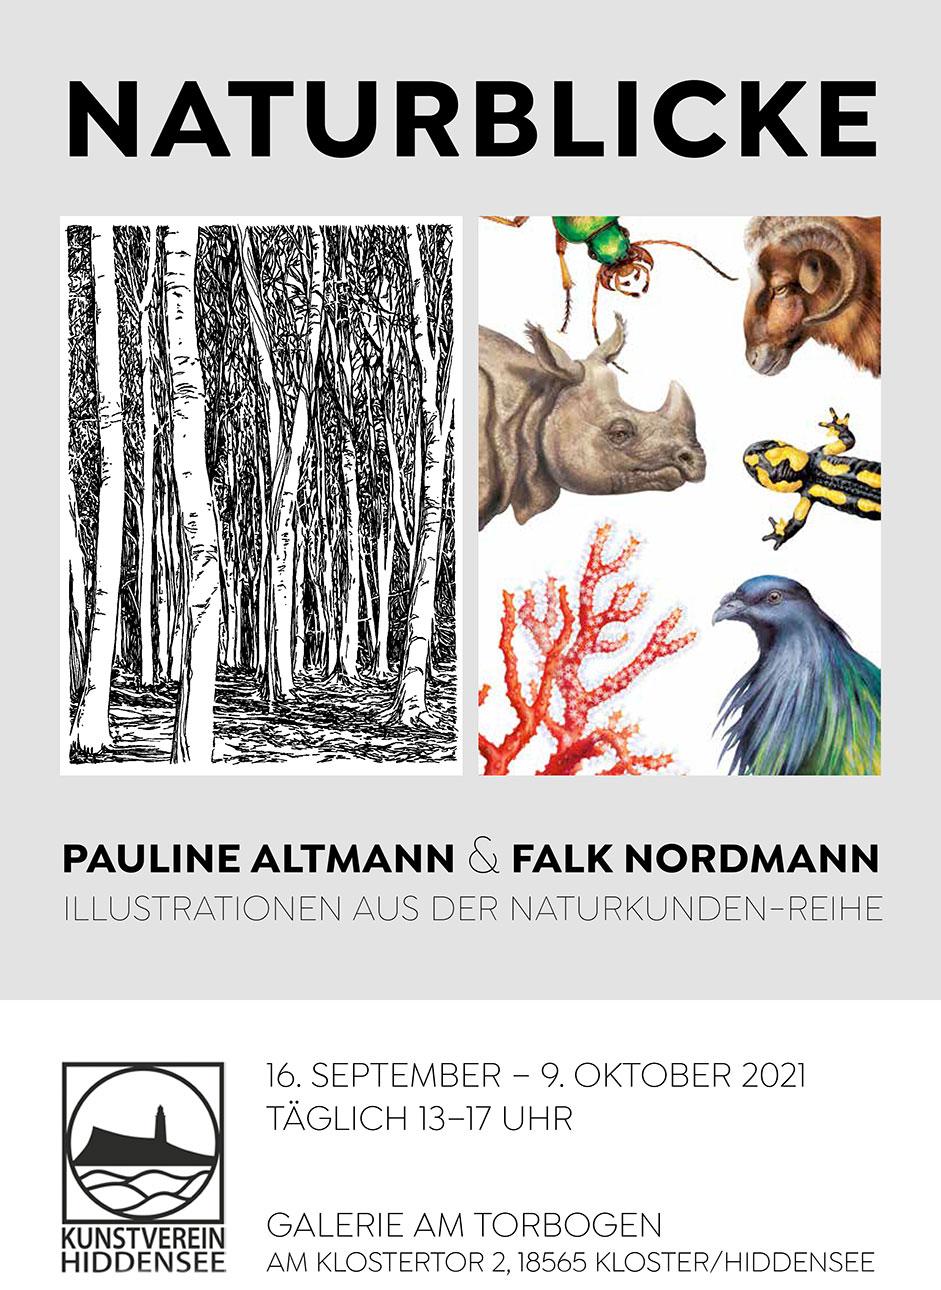 Pauline Altmann & Falk Nordmann